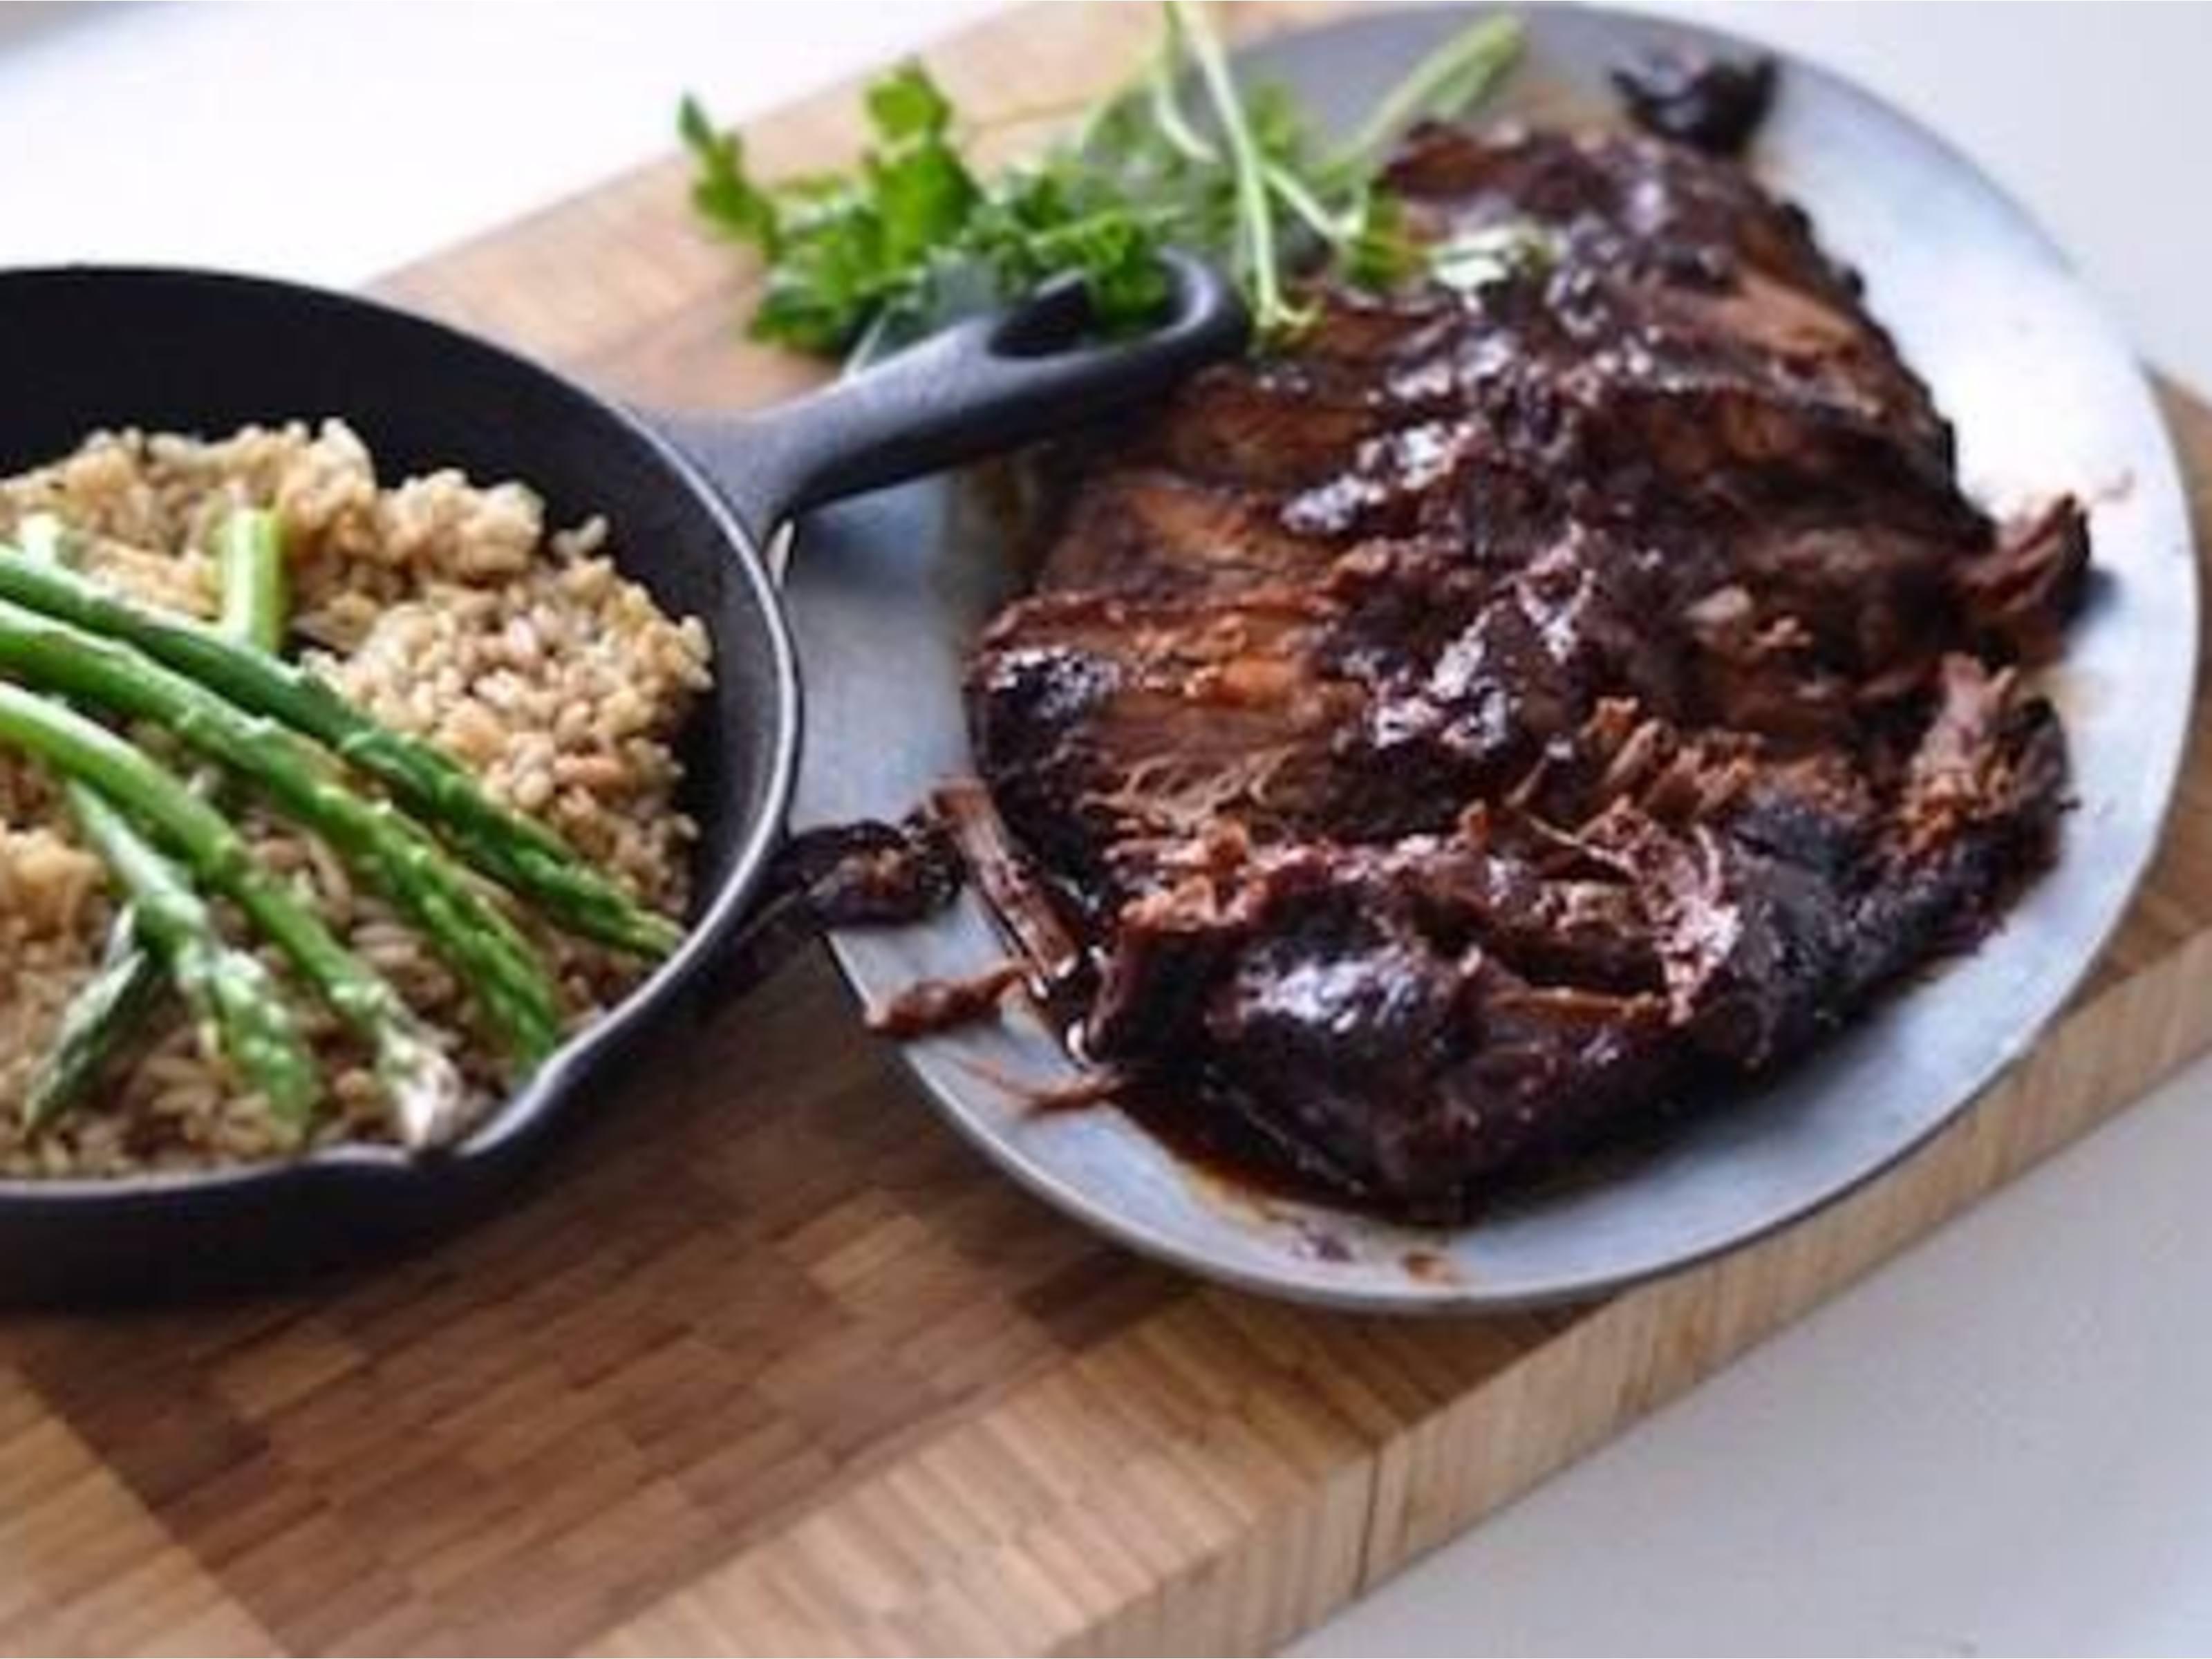 Savory Beef Brisket with Mushroom Rice